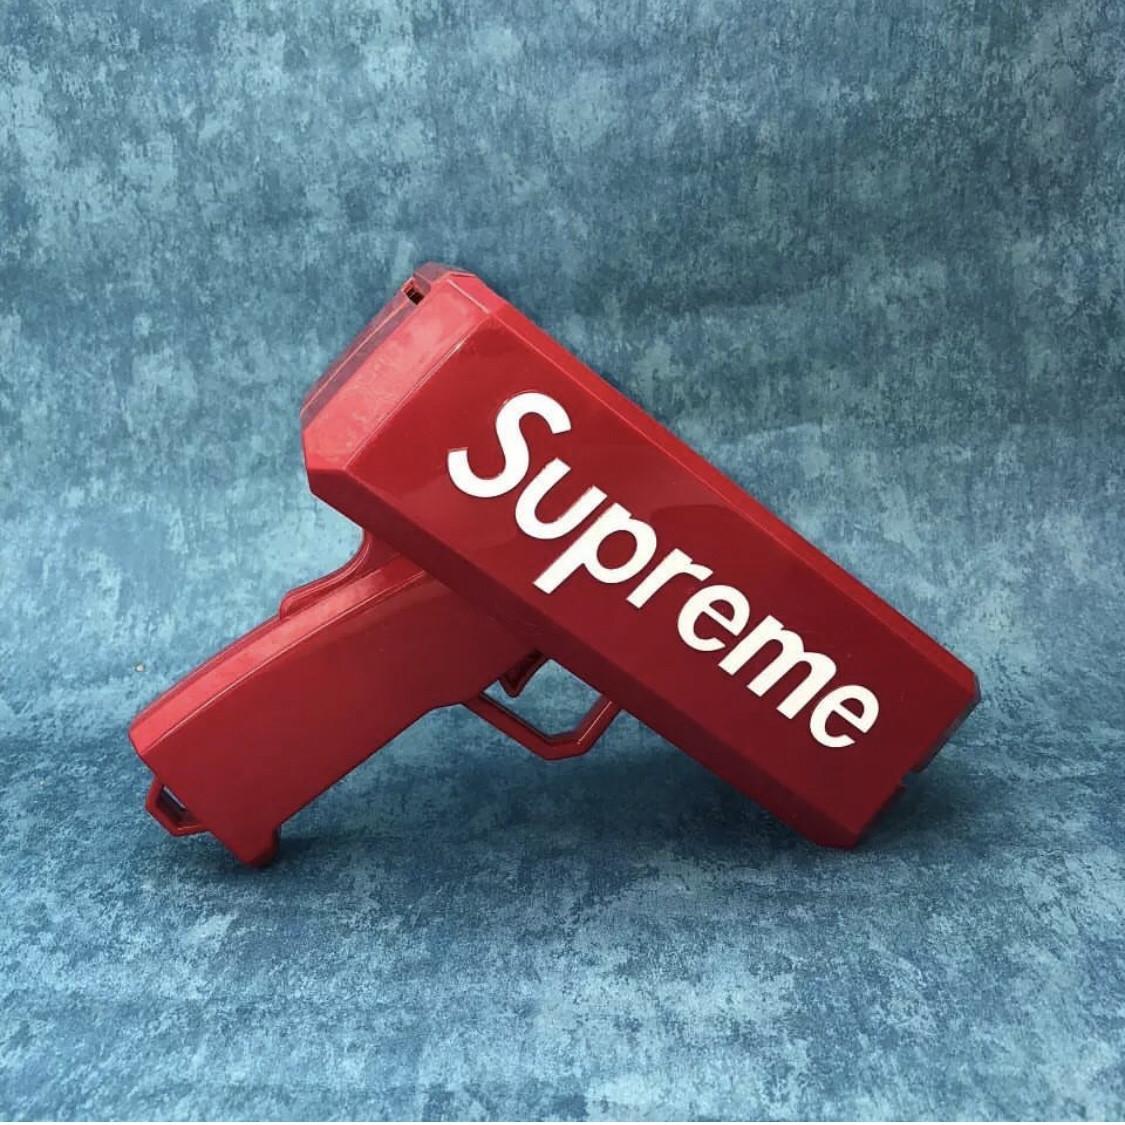 Пістолет SUPREME супрім маниган money gun метальник грошей